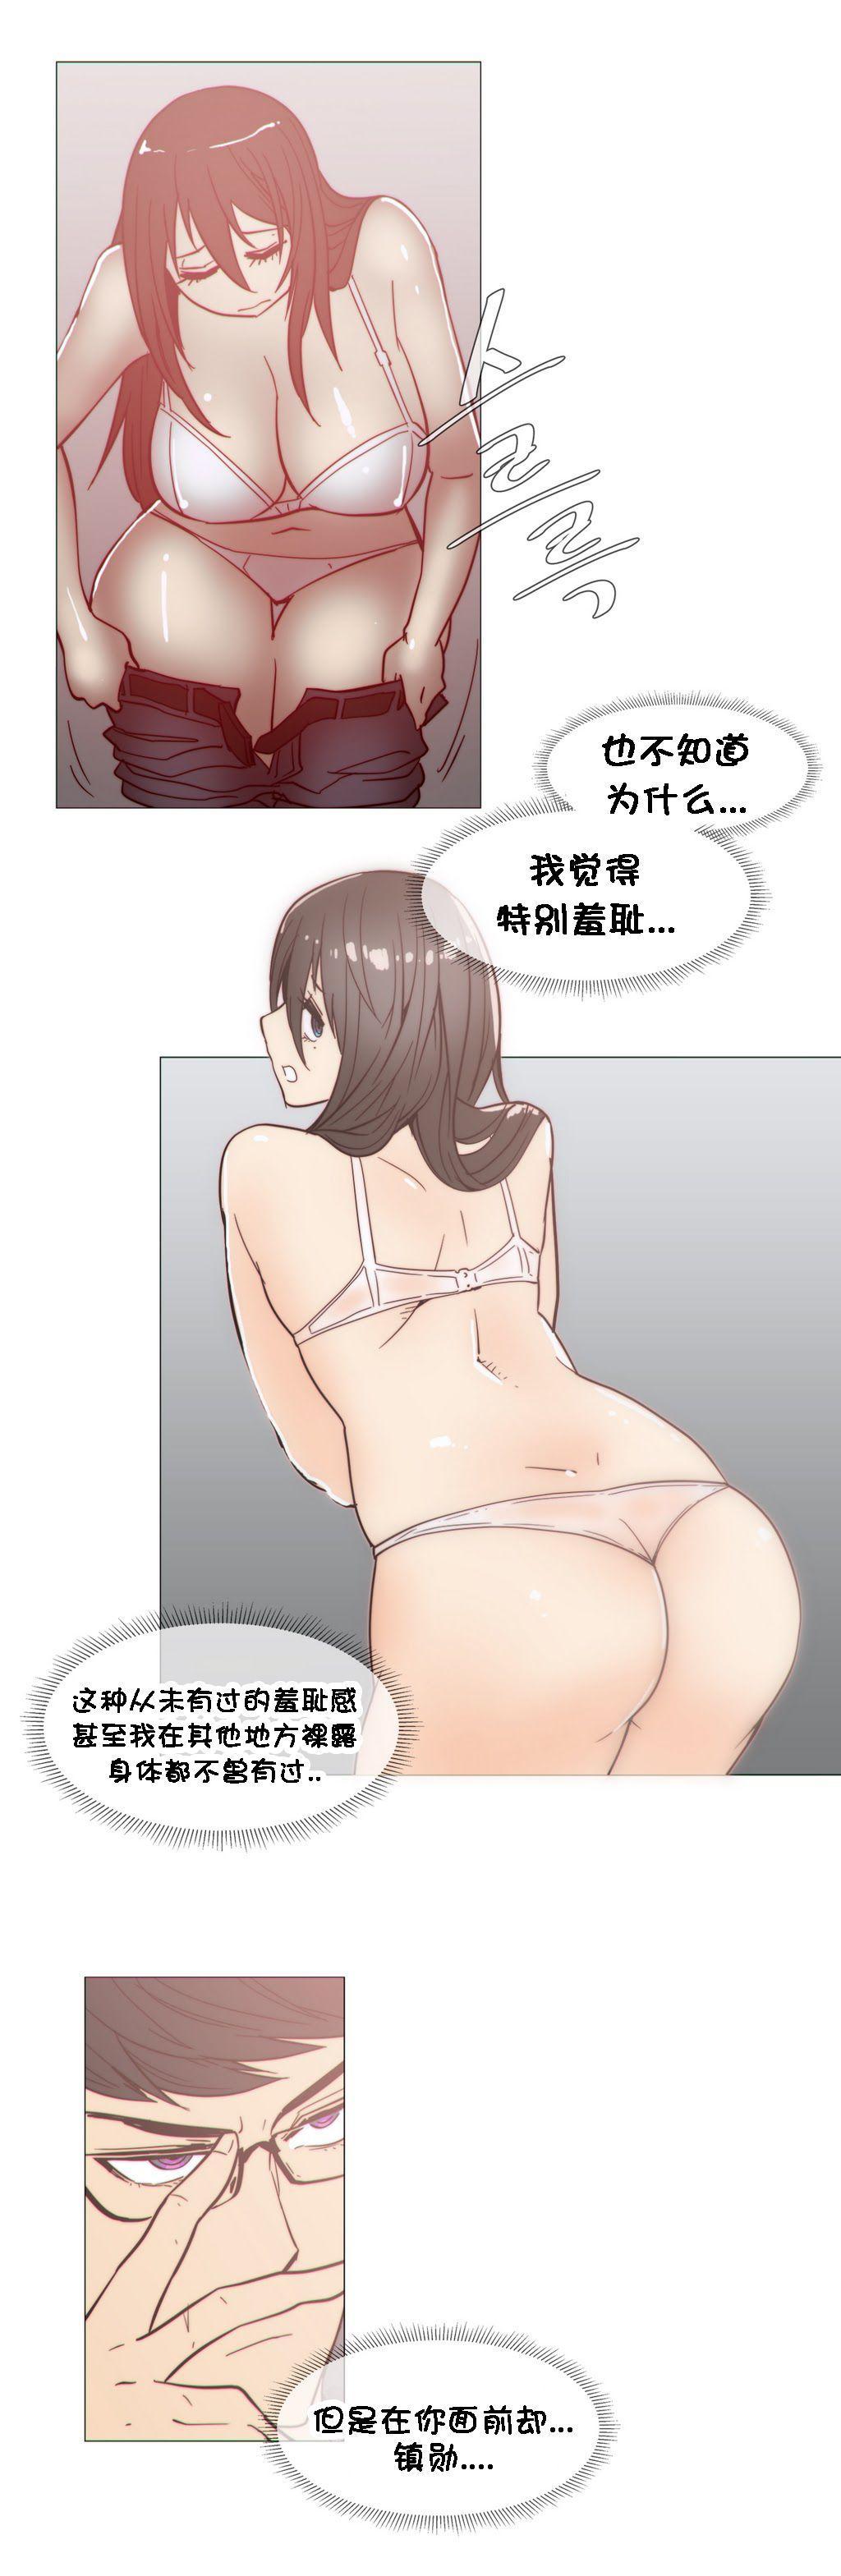 HouseHold Affairs 【卞赤鲤个人汉化】1~33话(持续更新中) 609